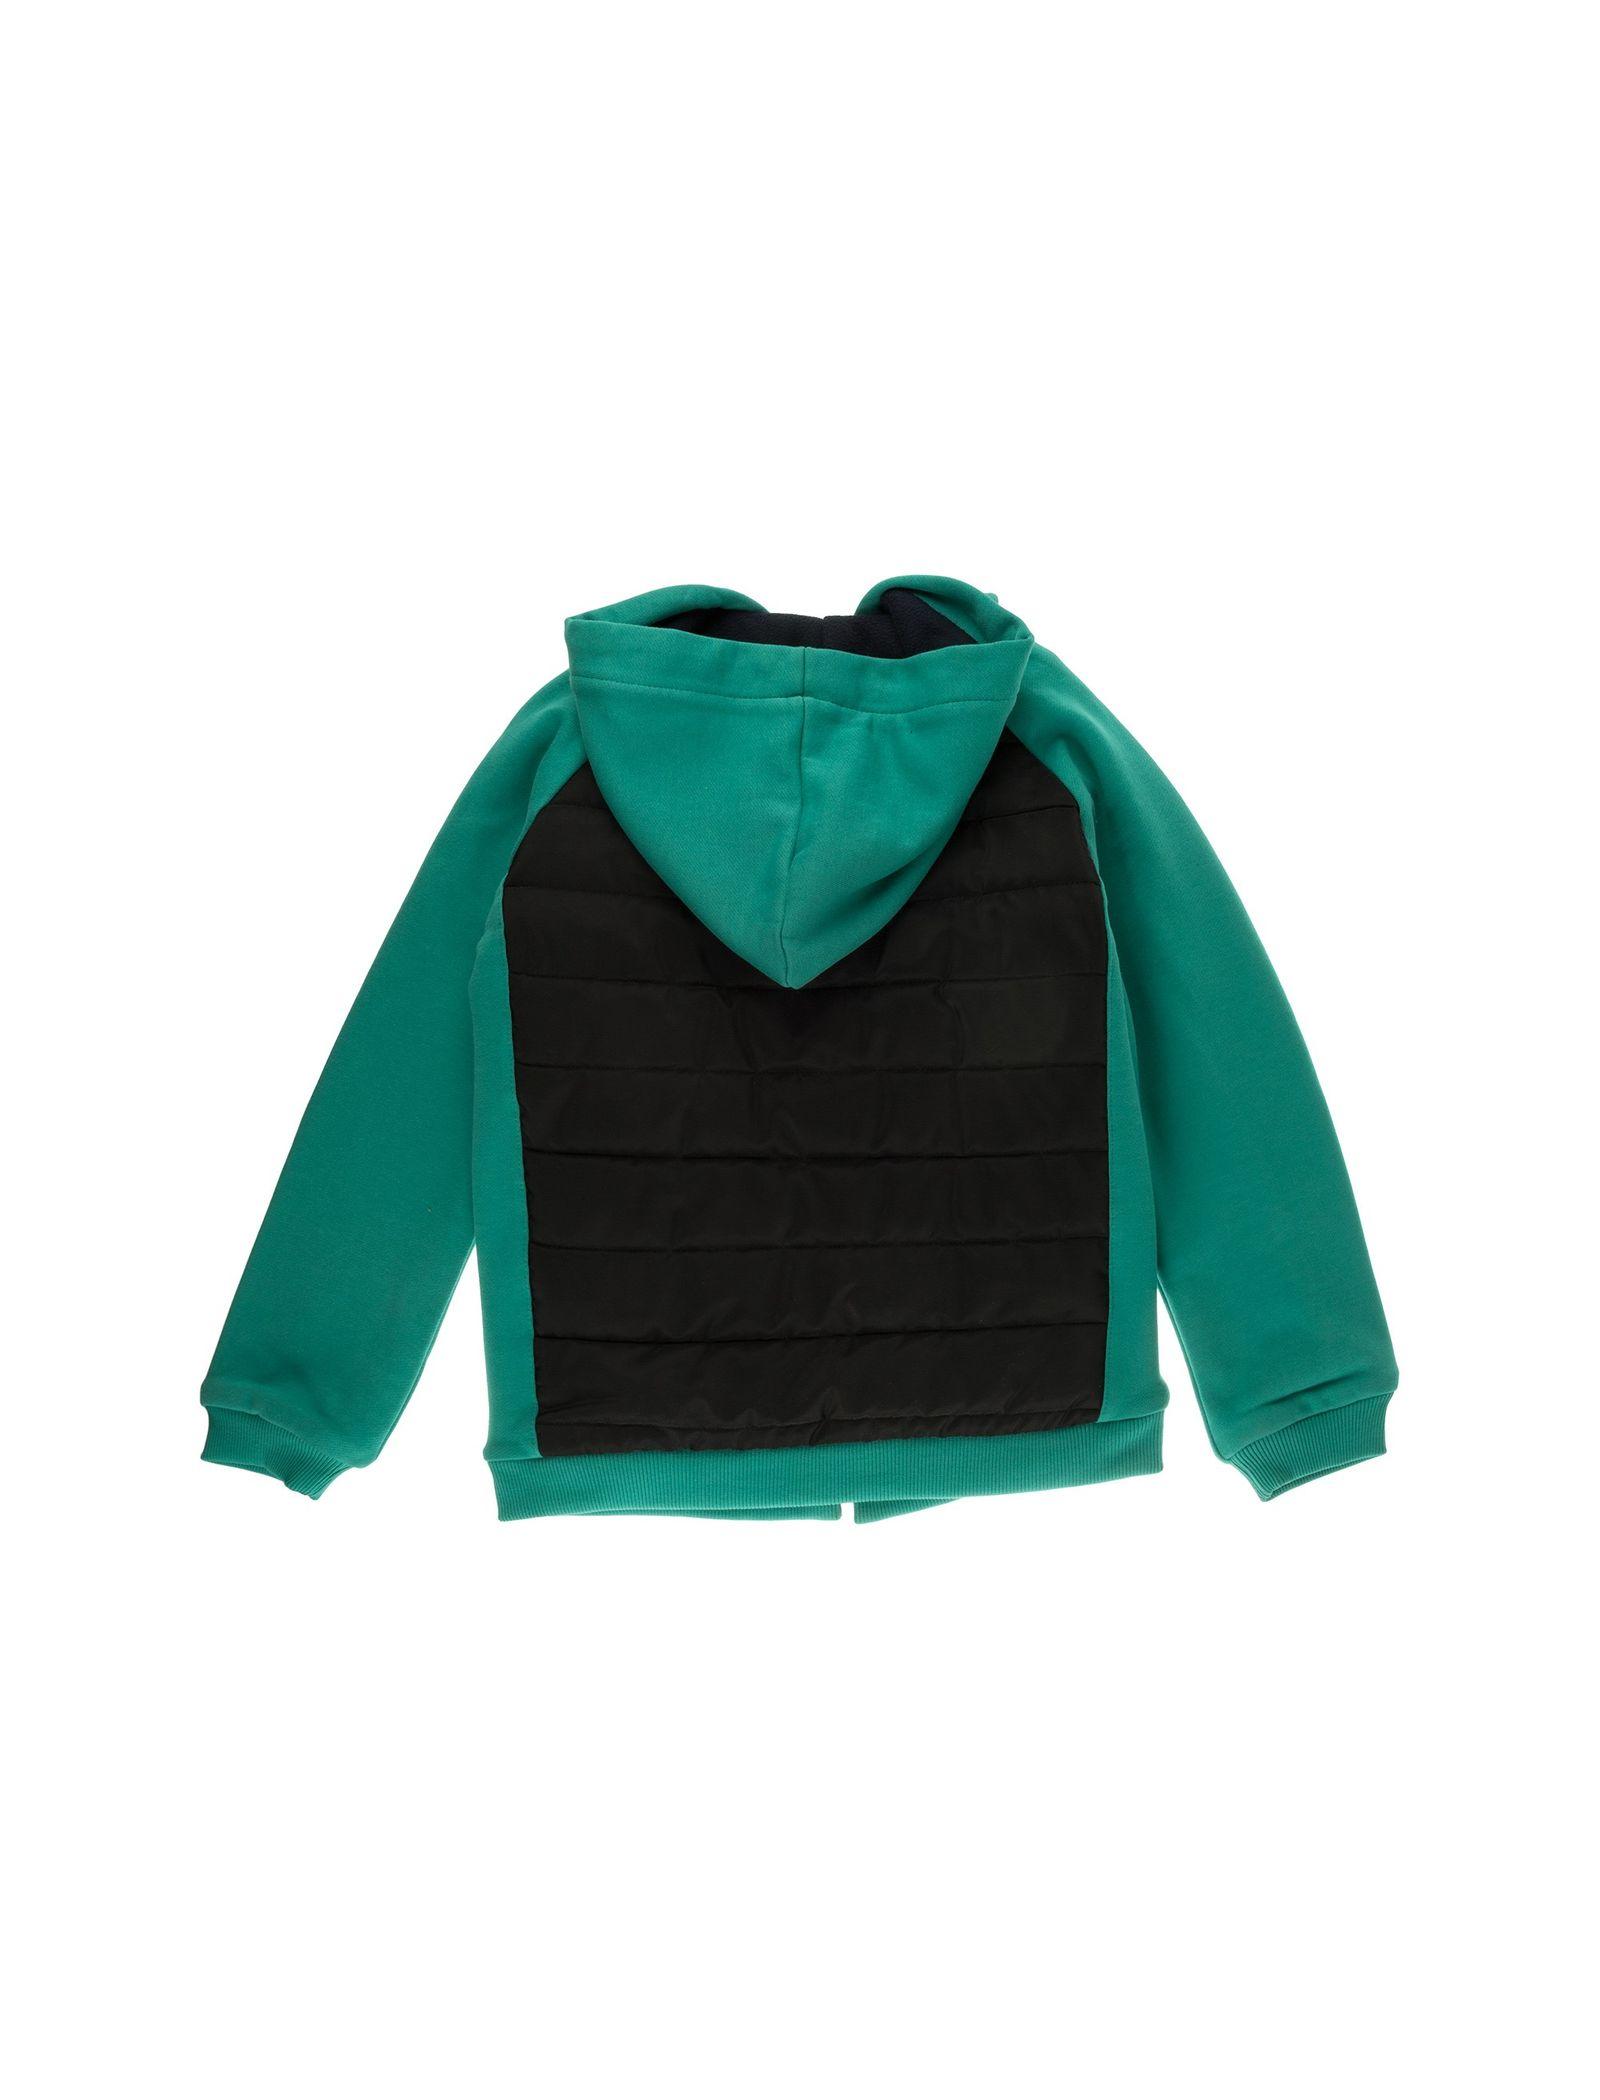 کاپشن نخی کلاه دار دخترانه - پیانو - سبز - 2